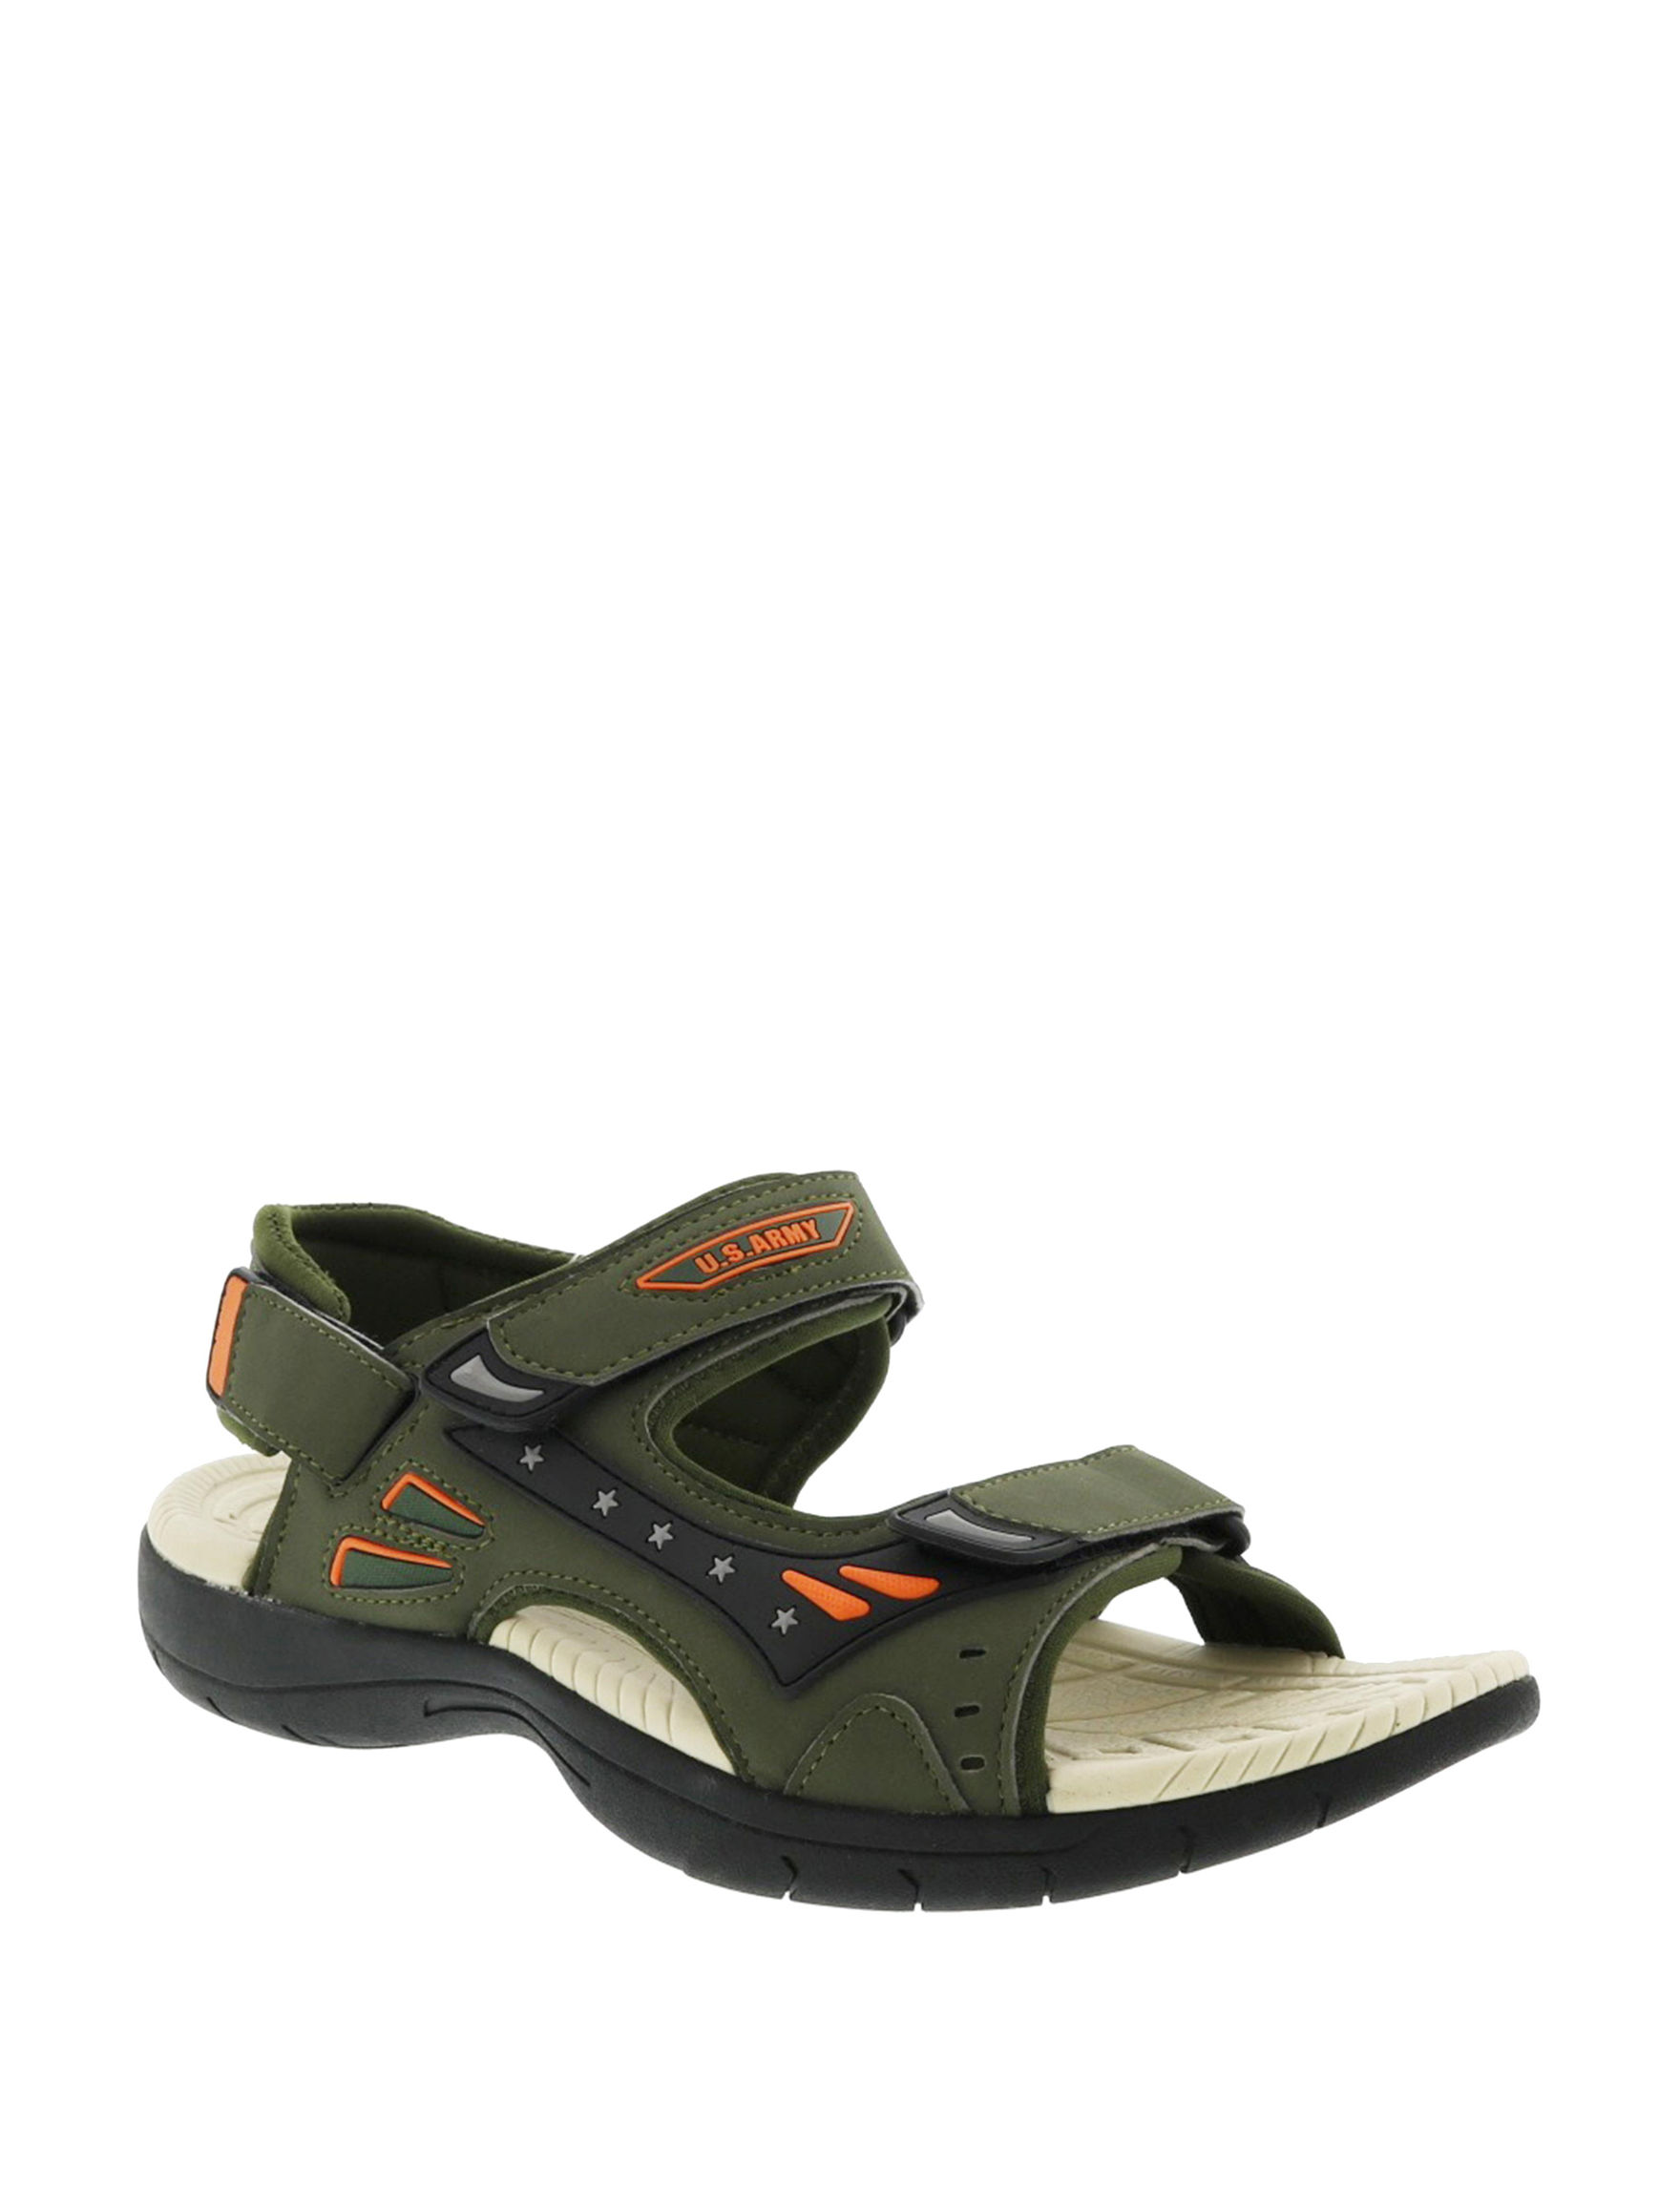 U.S. Army Olive Sport Sandals